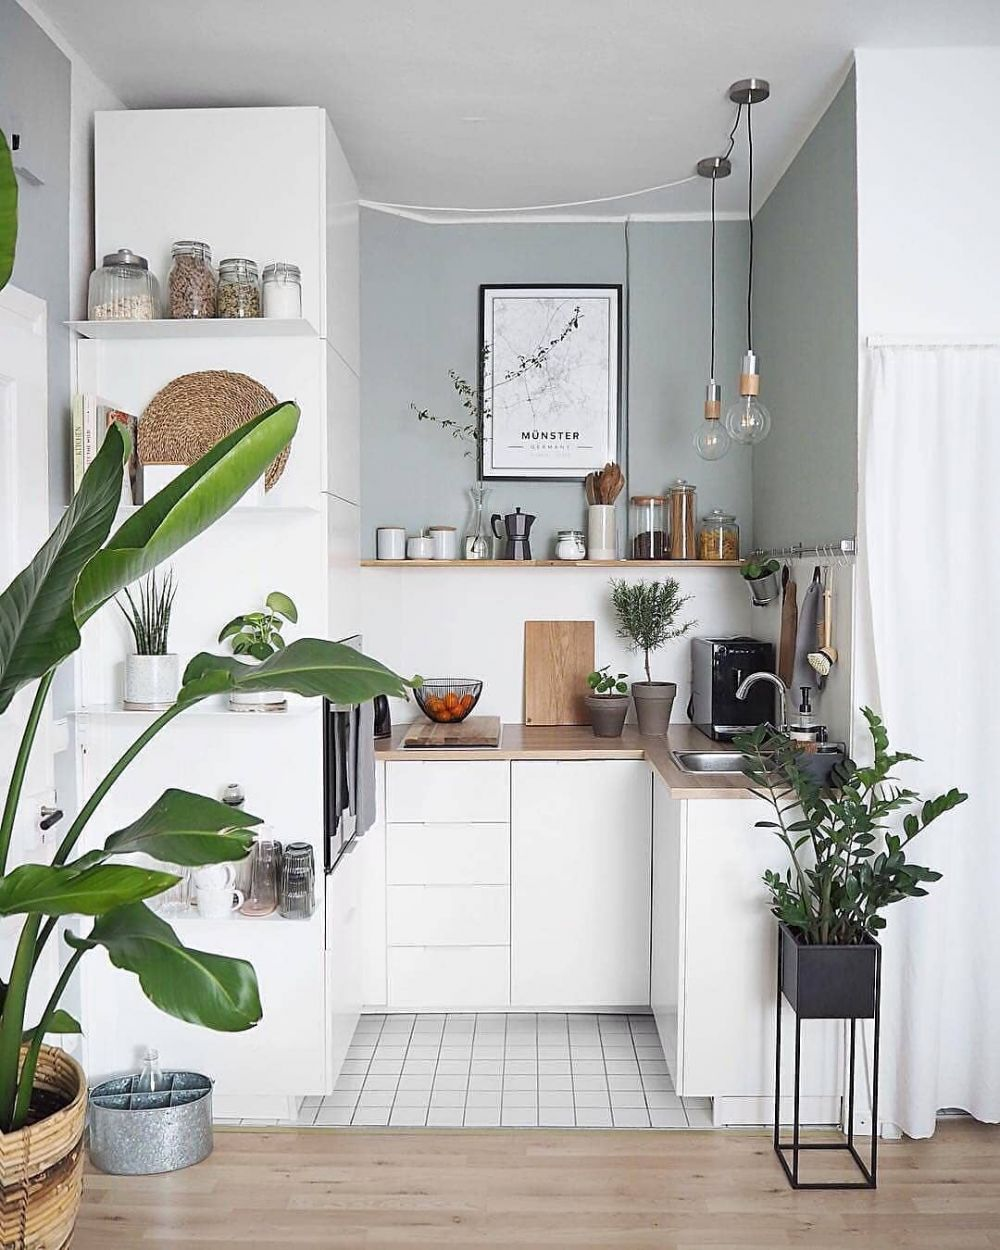 Dapur Minimalis: Inspirasi & Tips Menata Dapur • Sikatabis.com